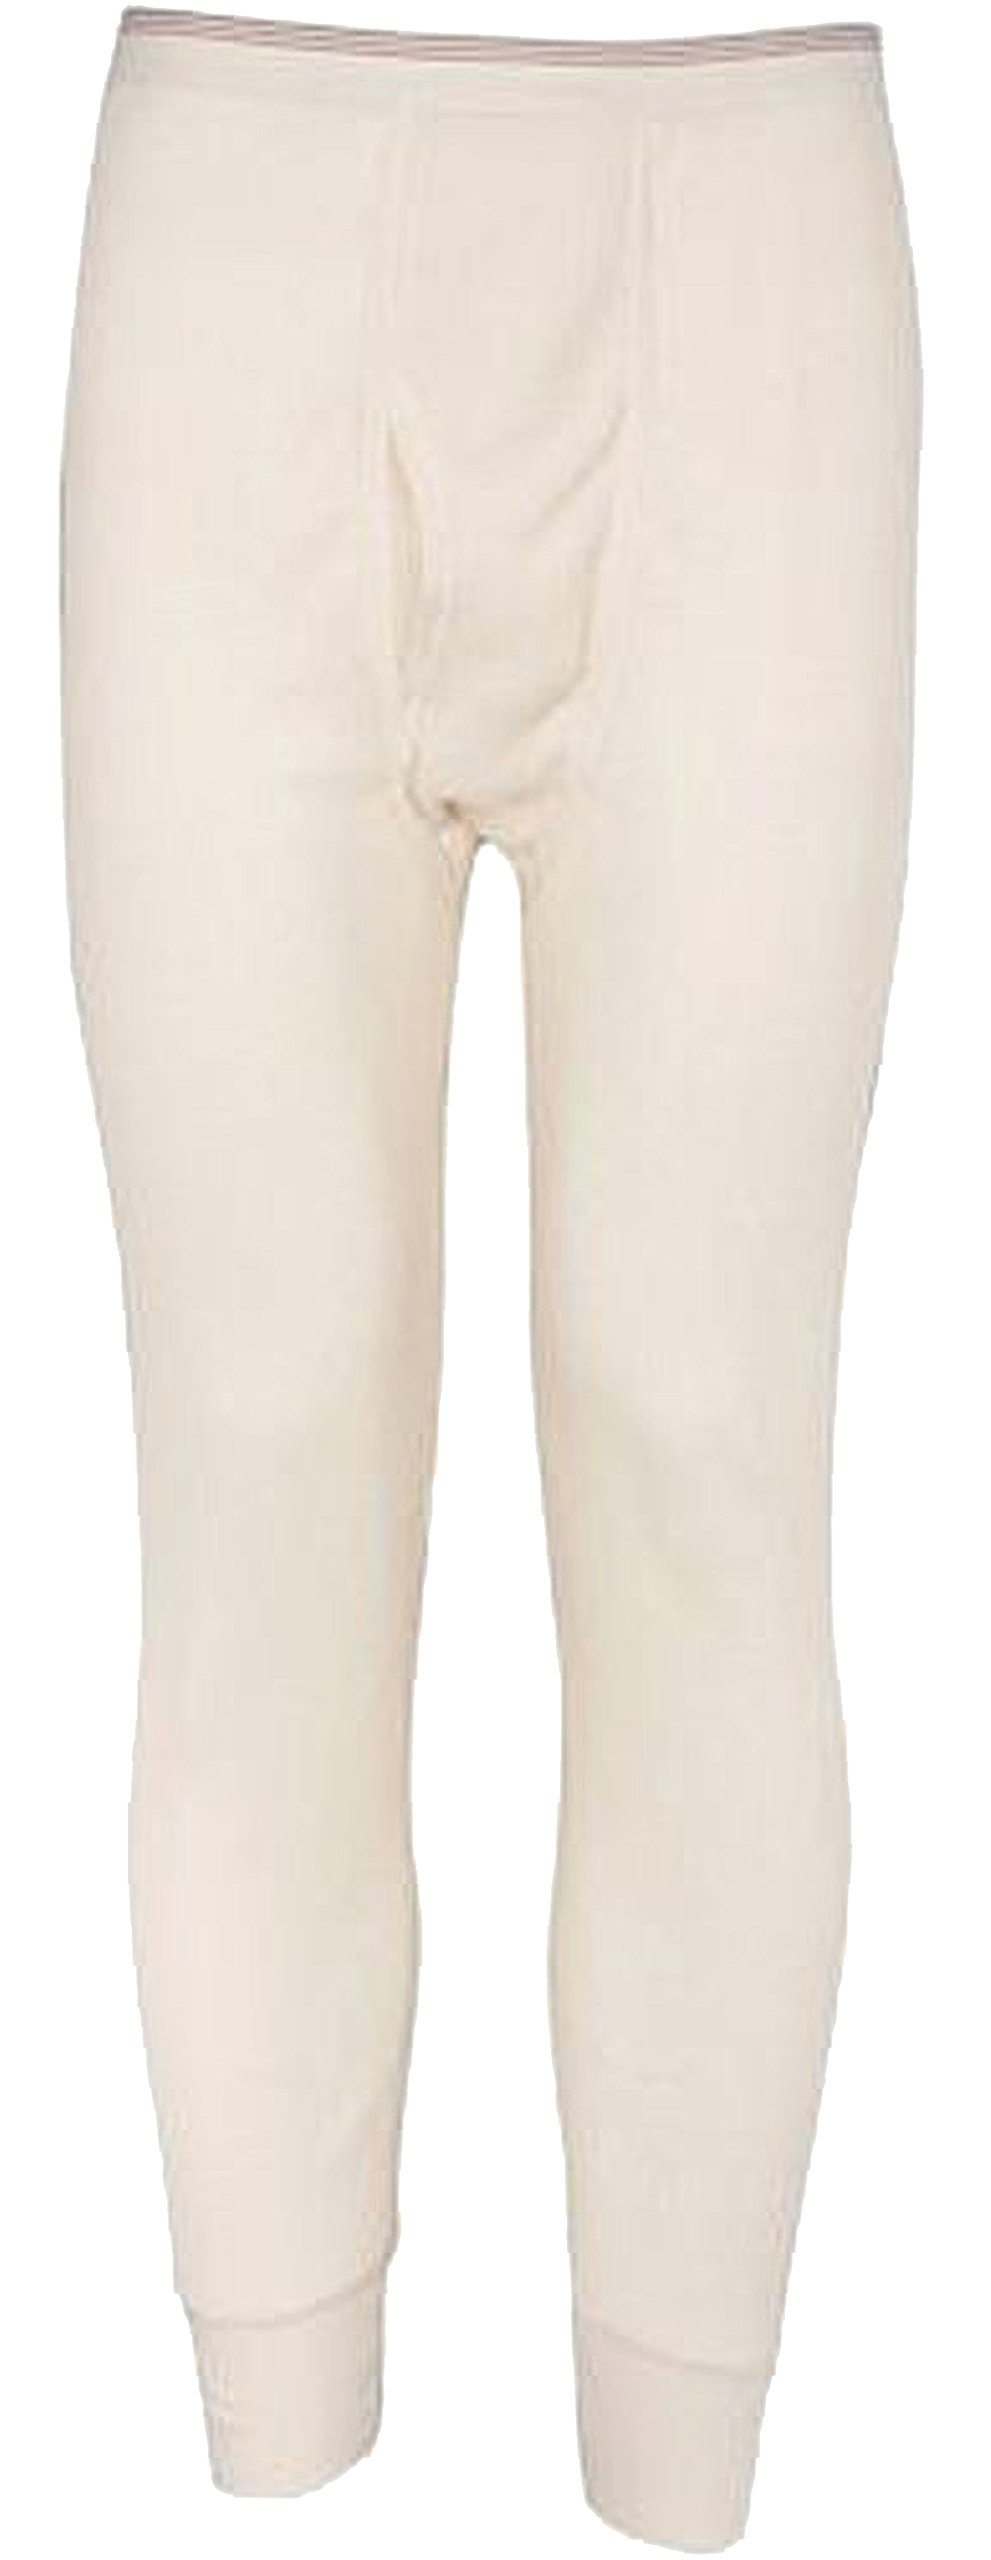 Indera Mills Colored Thermal Long John Bottoms,Medium,Natural